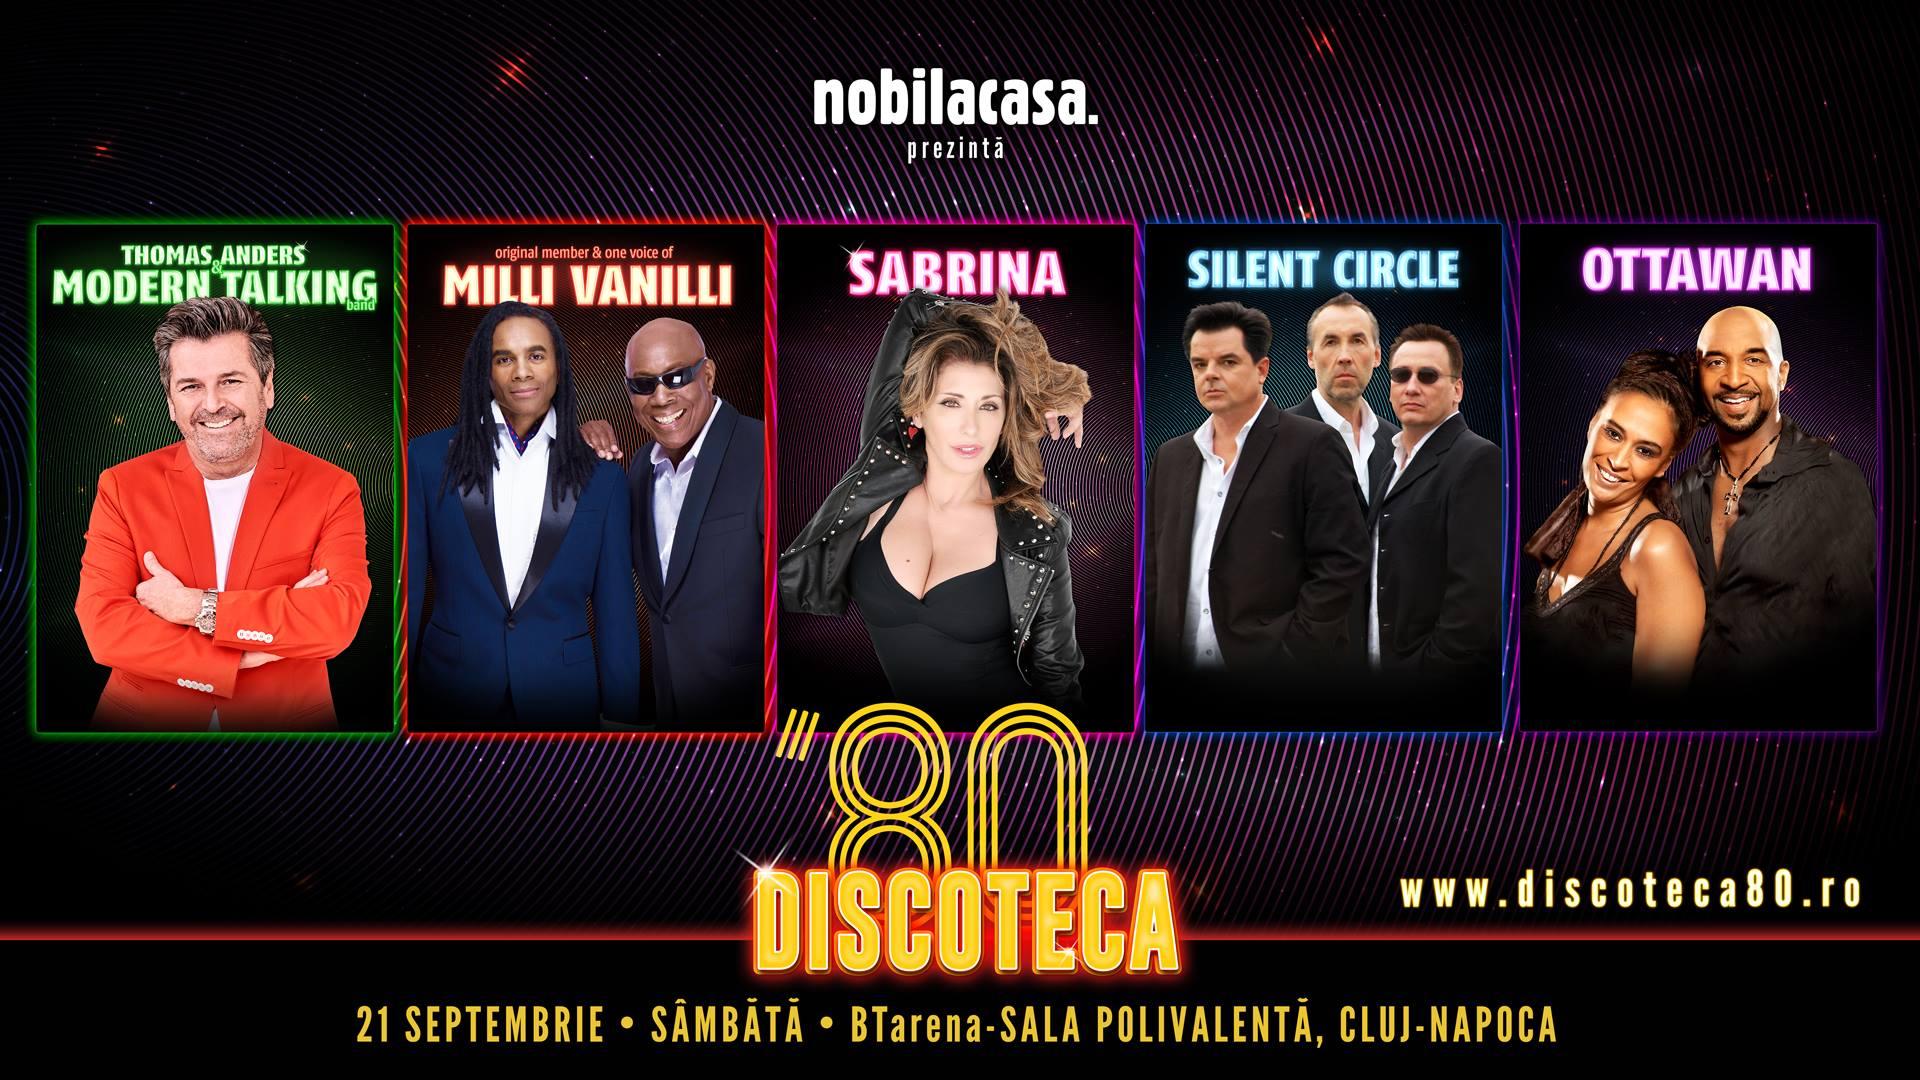 Thomas Anders & Modern Talking, Milli Vanilli, Sabrina, Silent Circle şi OTTAWAN, invitaţii ediţiei a treia DISCOTECA '80!